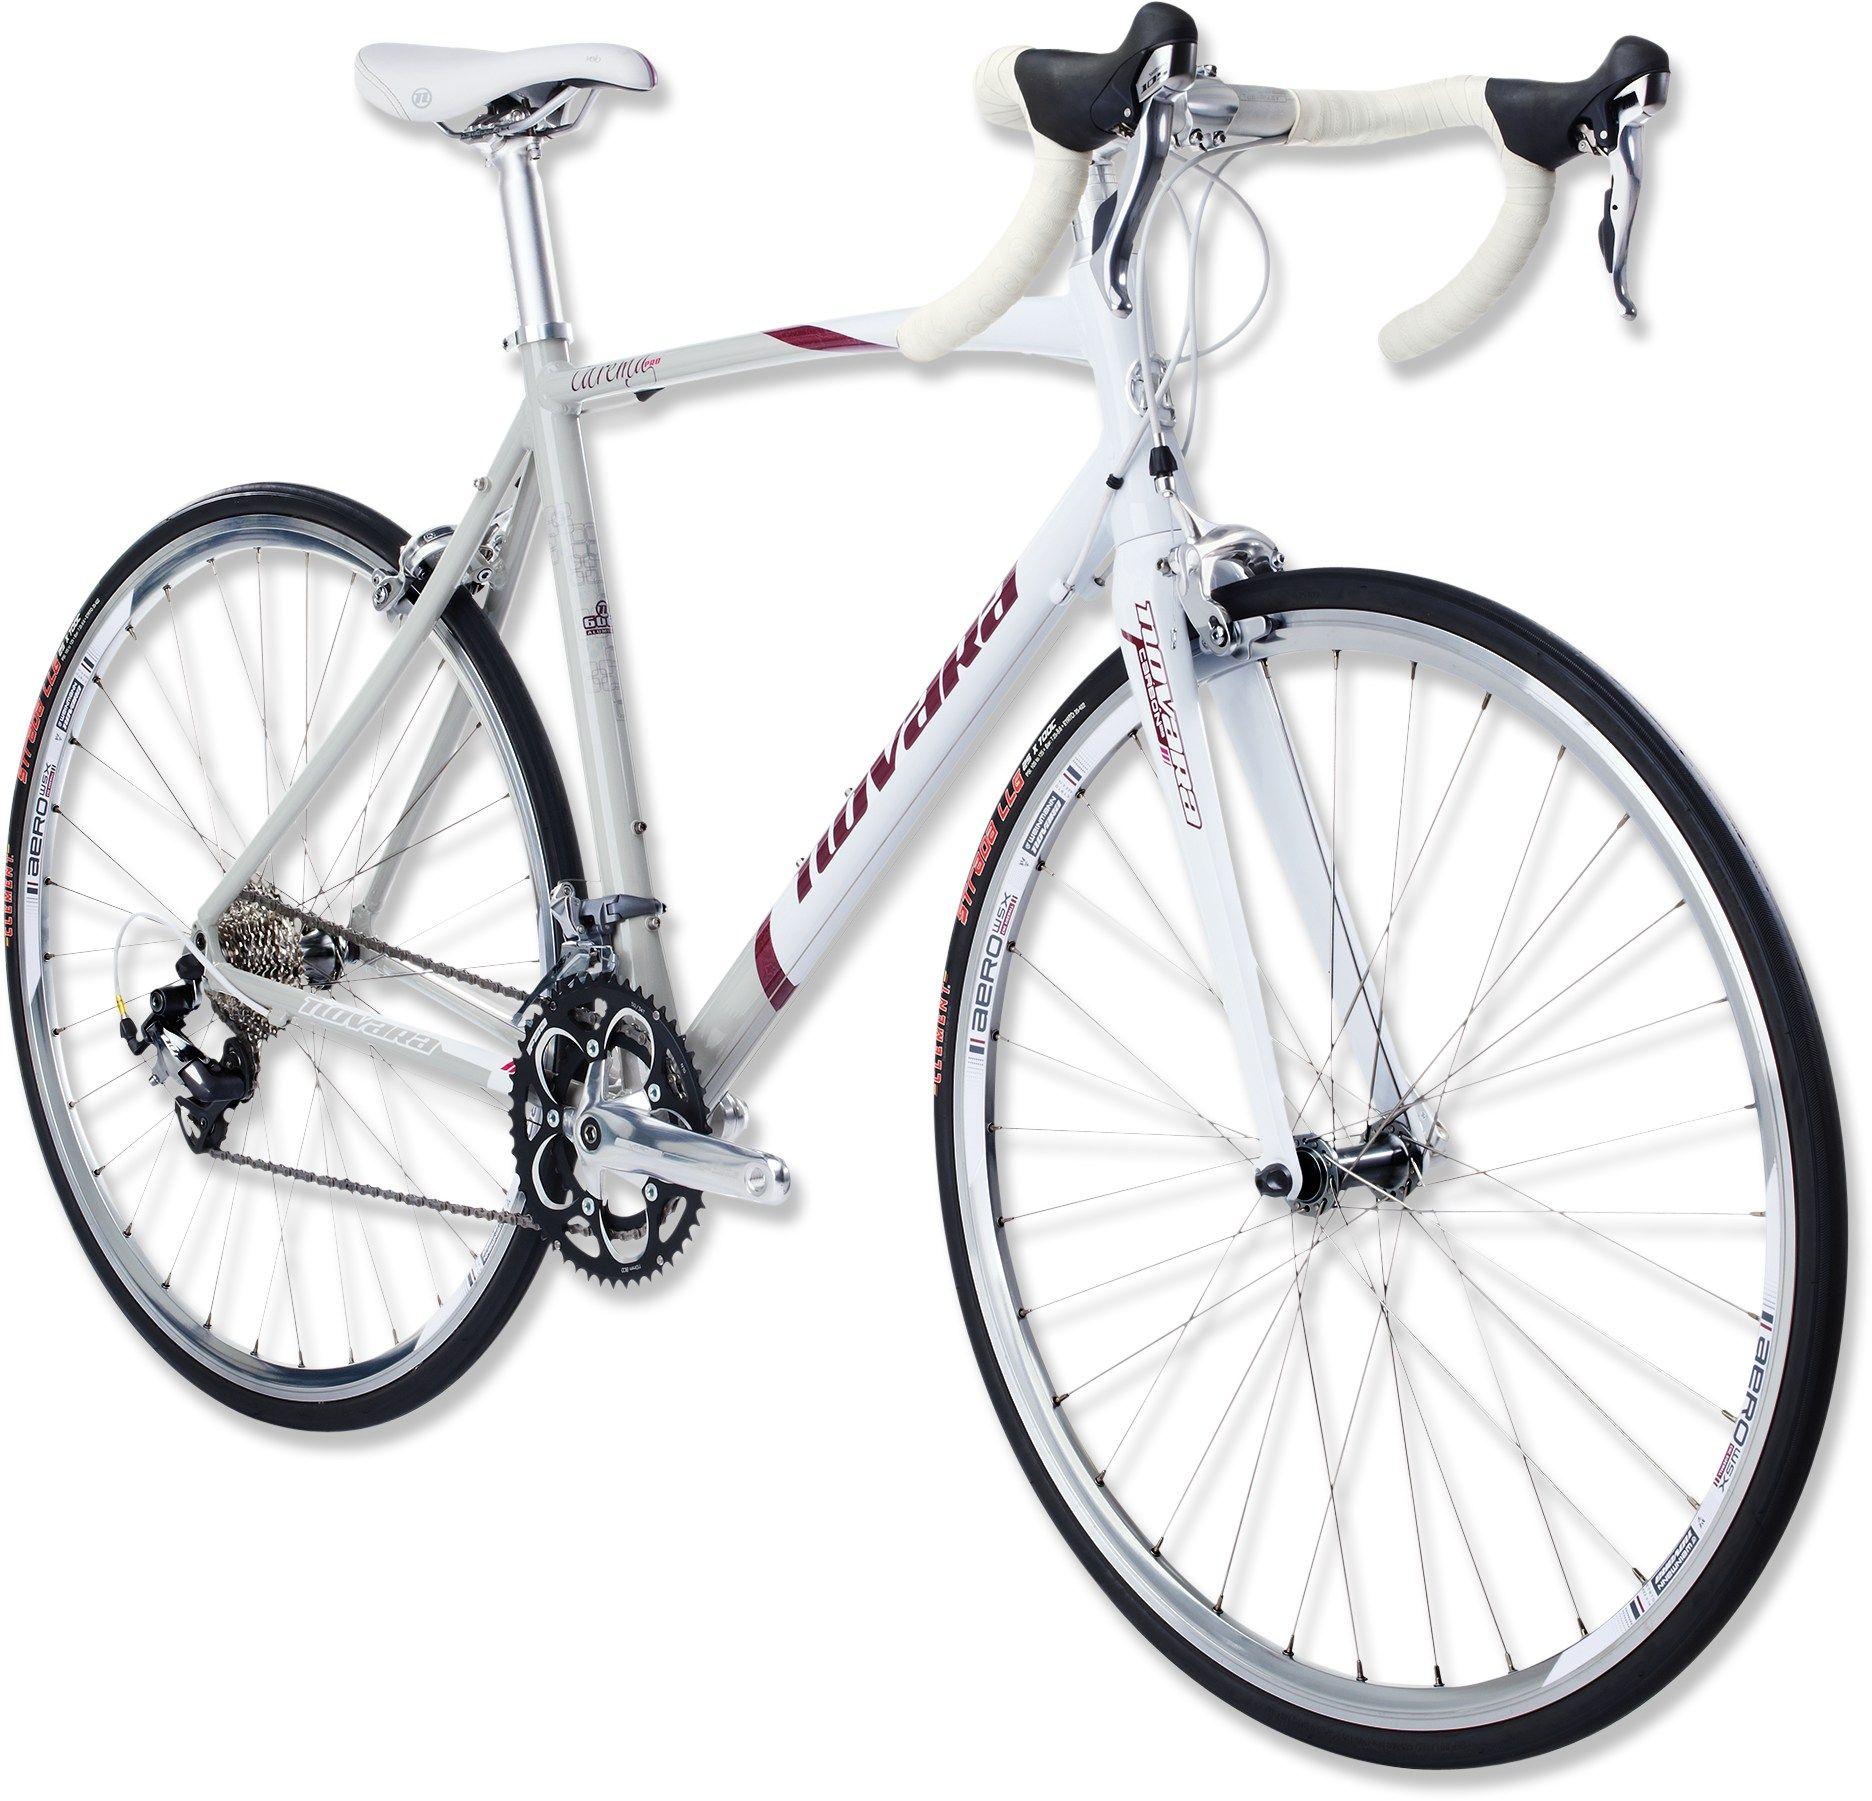 Novara Carema Pro Women S Bike 2013 At Rei Com Fitness Pinterest